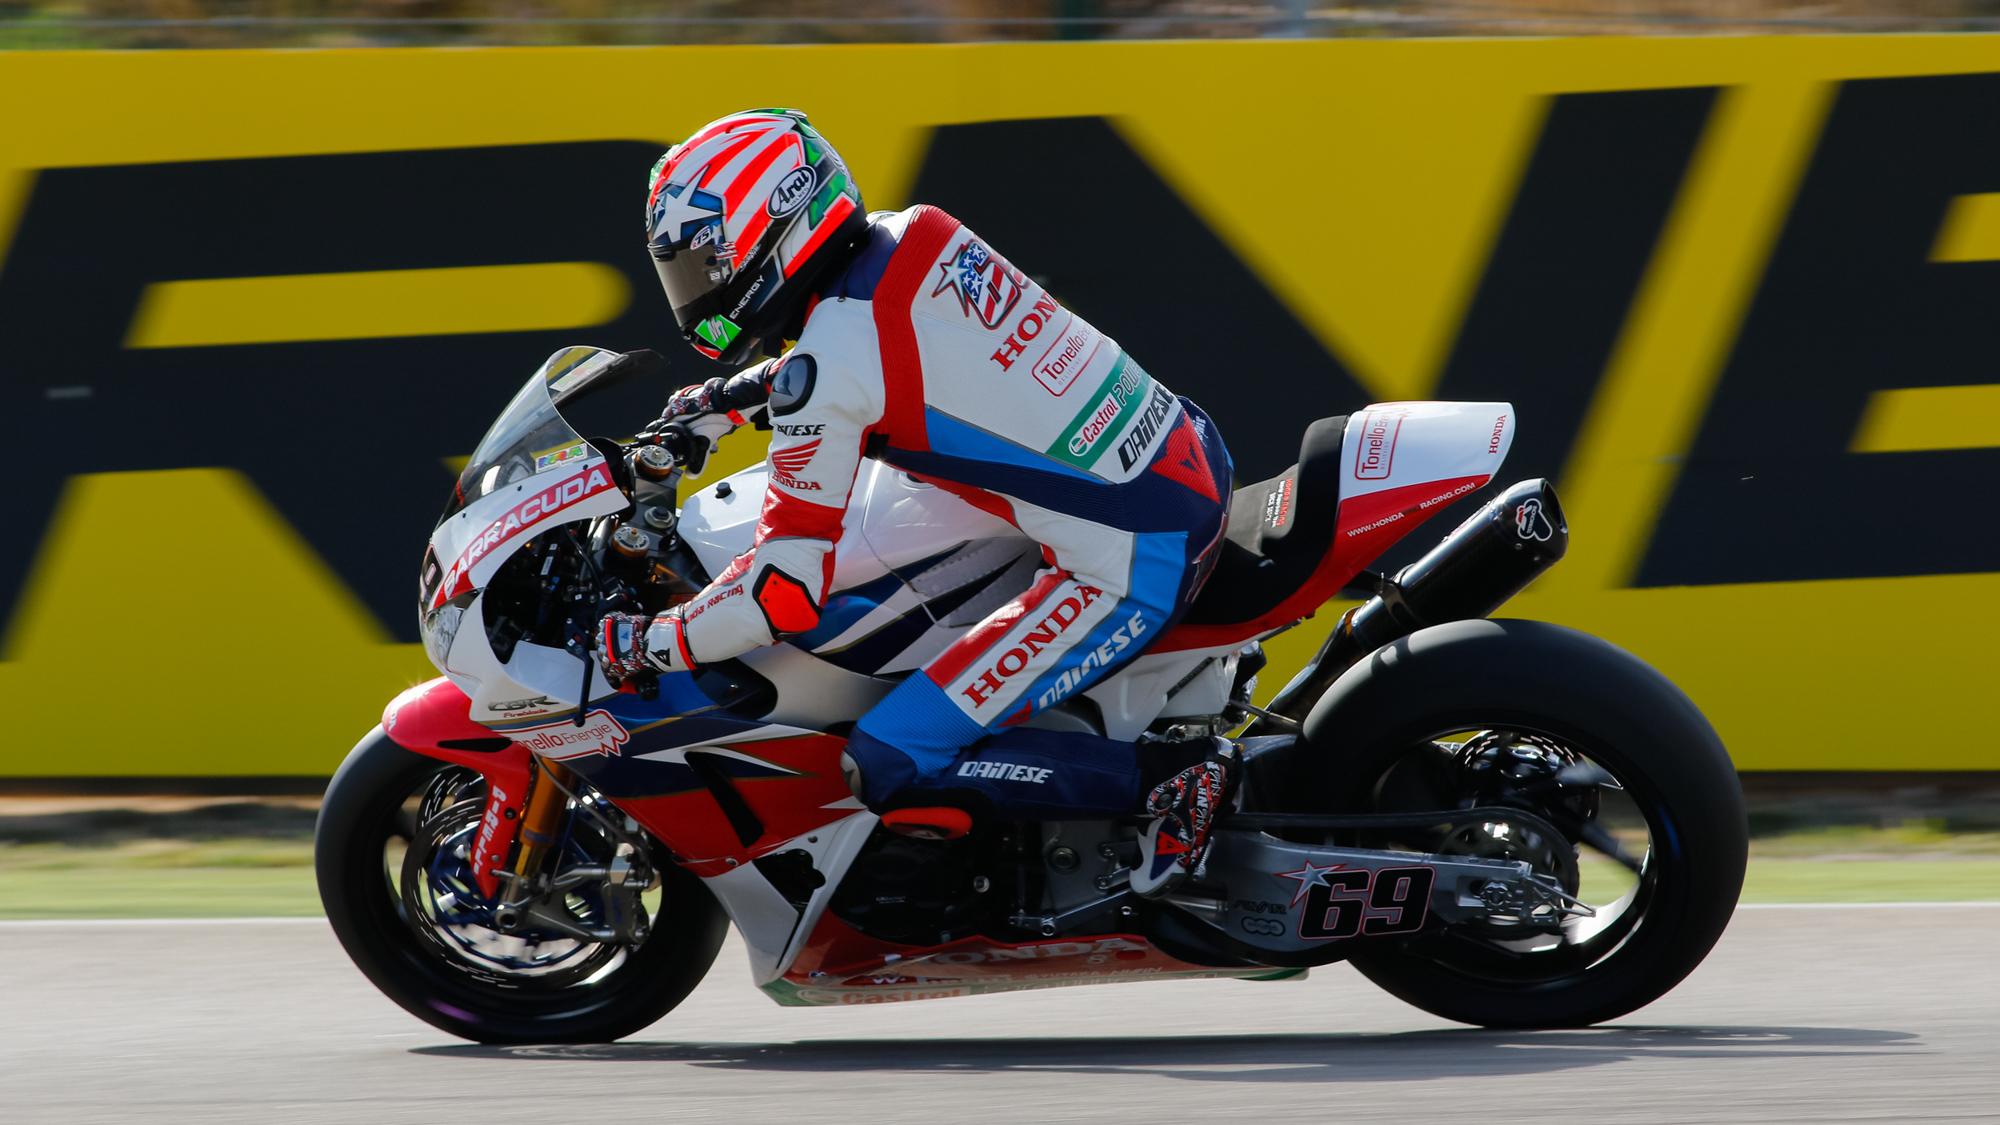 Motogp Qatar Start Time Gmt | MotoGP 2017 Info, Video, Points Table